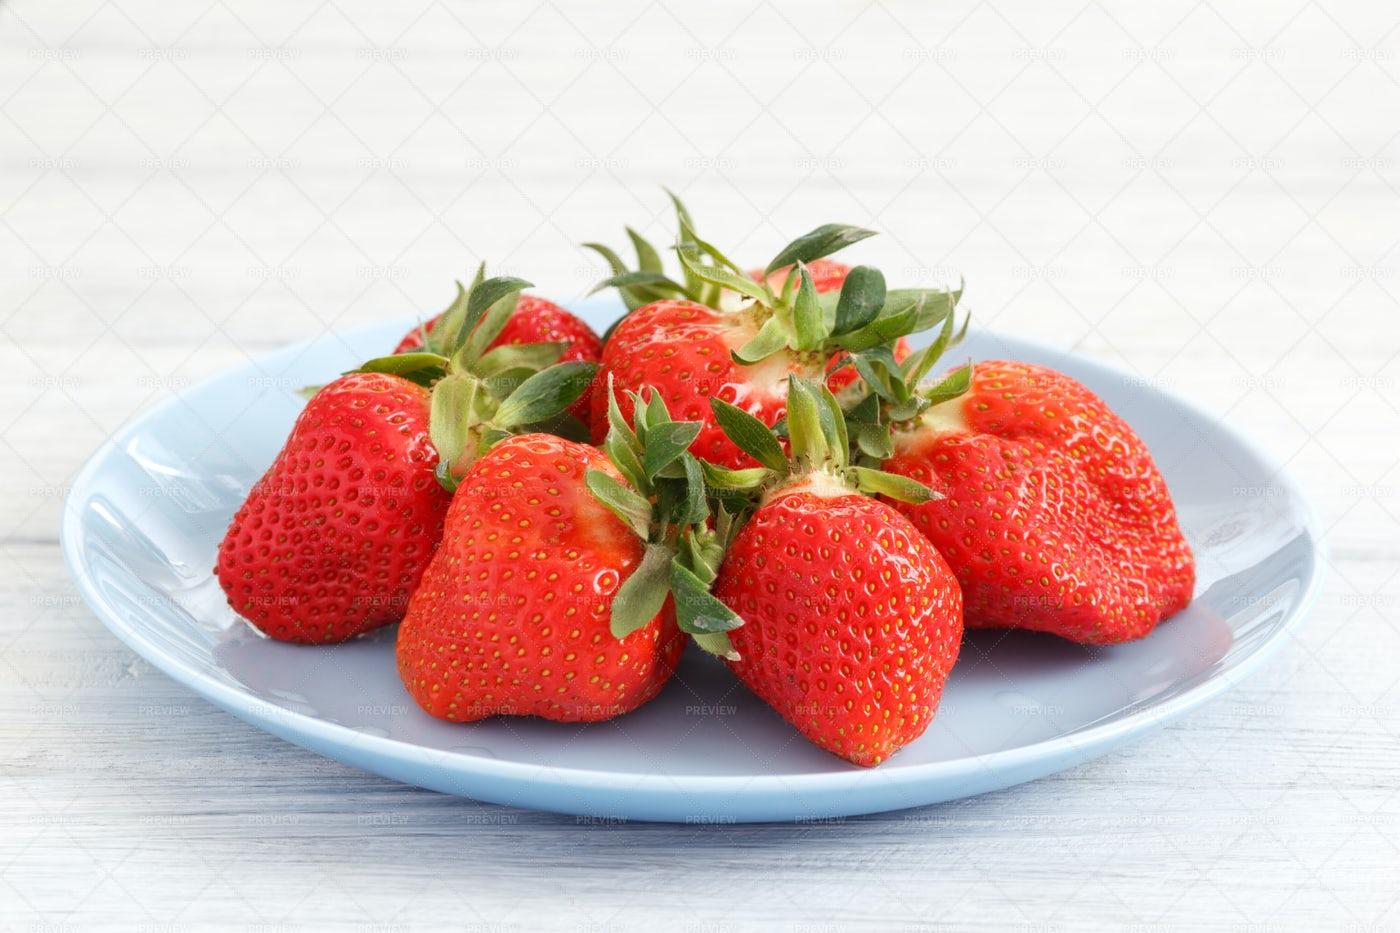 Fresh Strawberry On Plate: Stock Photos